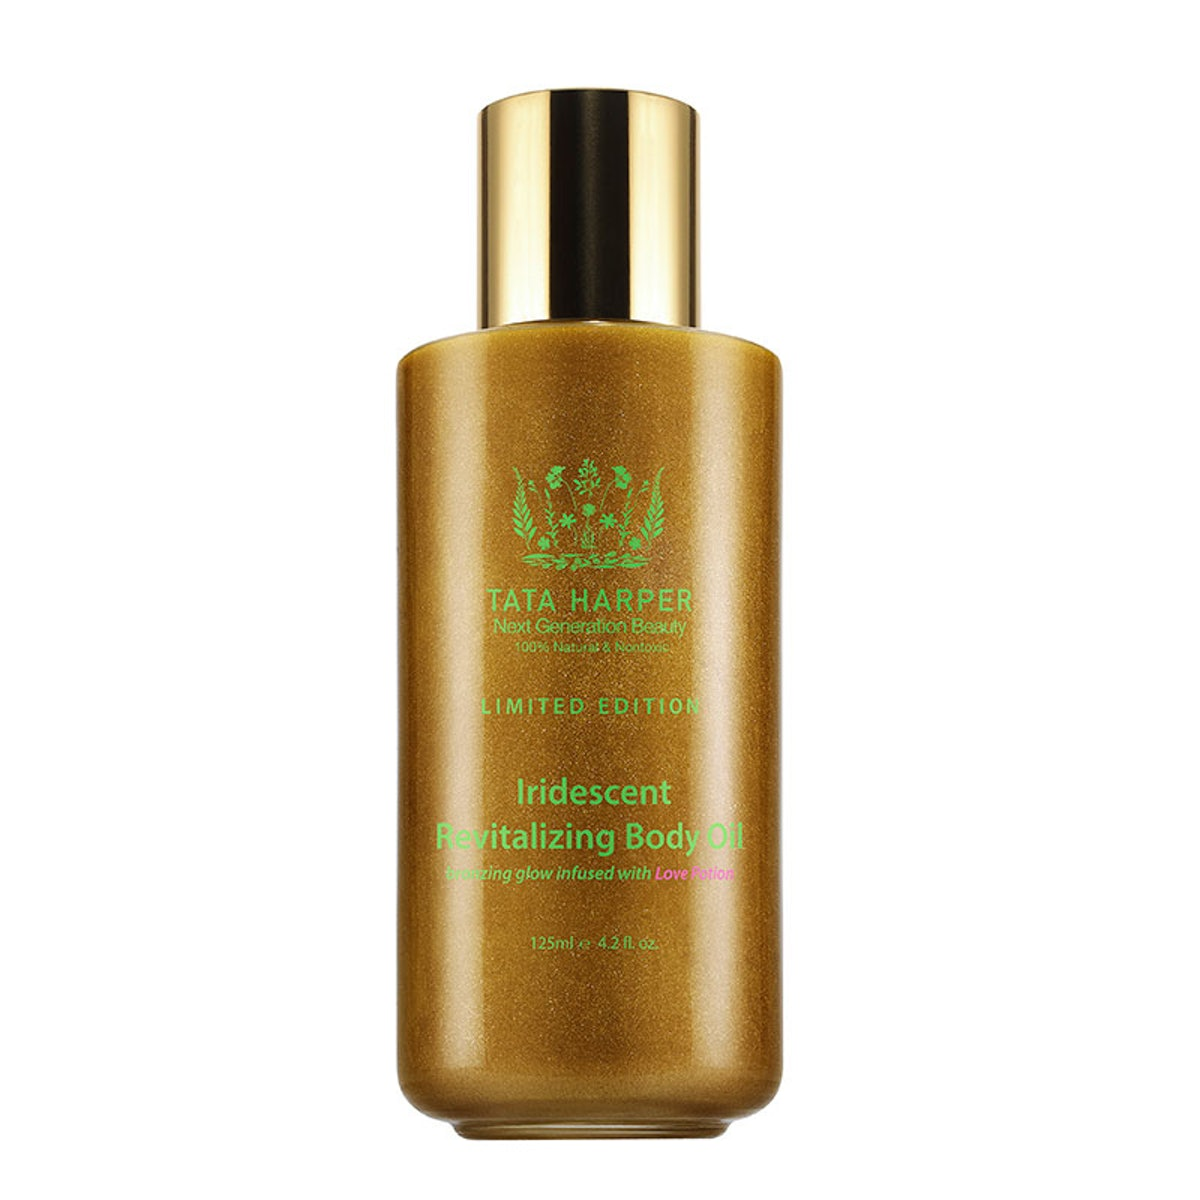 Tata Harper limited-edition love potion iridescent revitalizing body oil